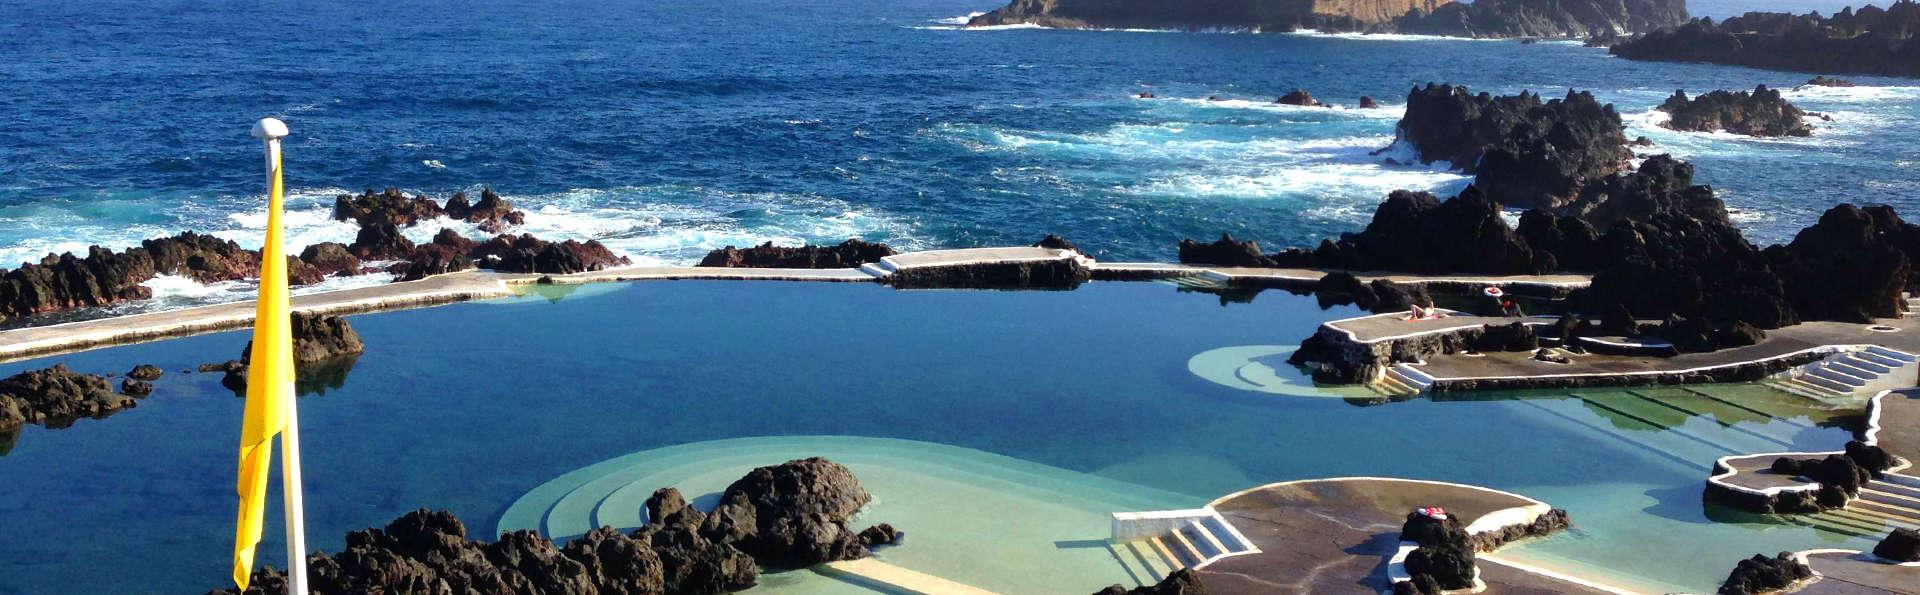 Aqua Natura Madeira Hotel - EDIT_Pool.jpg